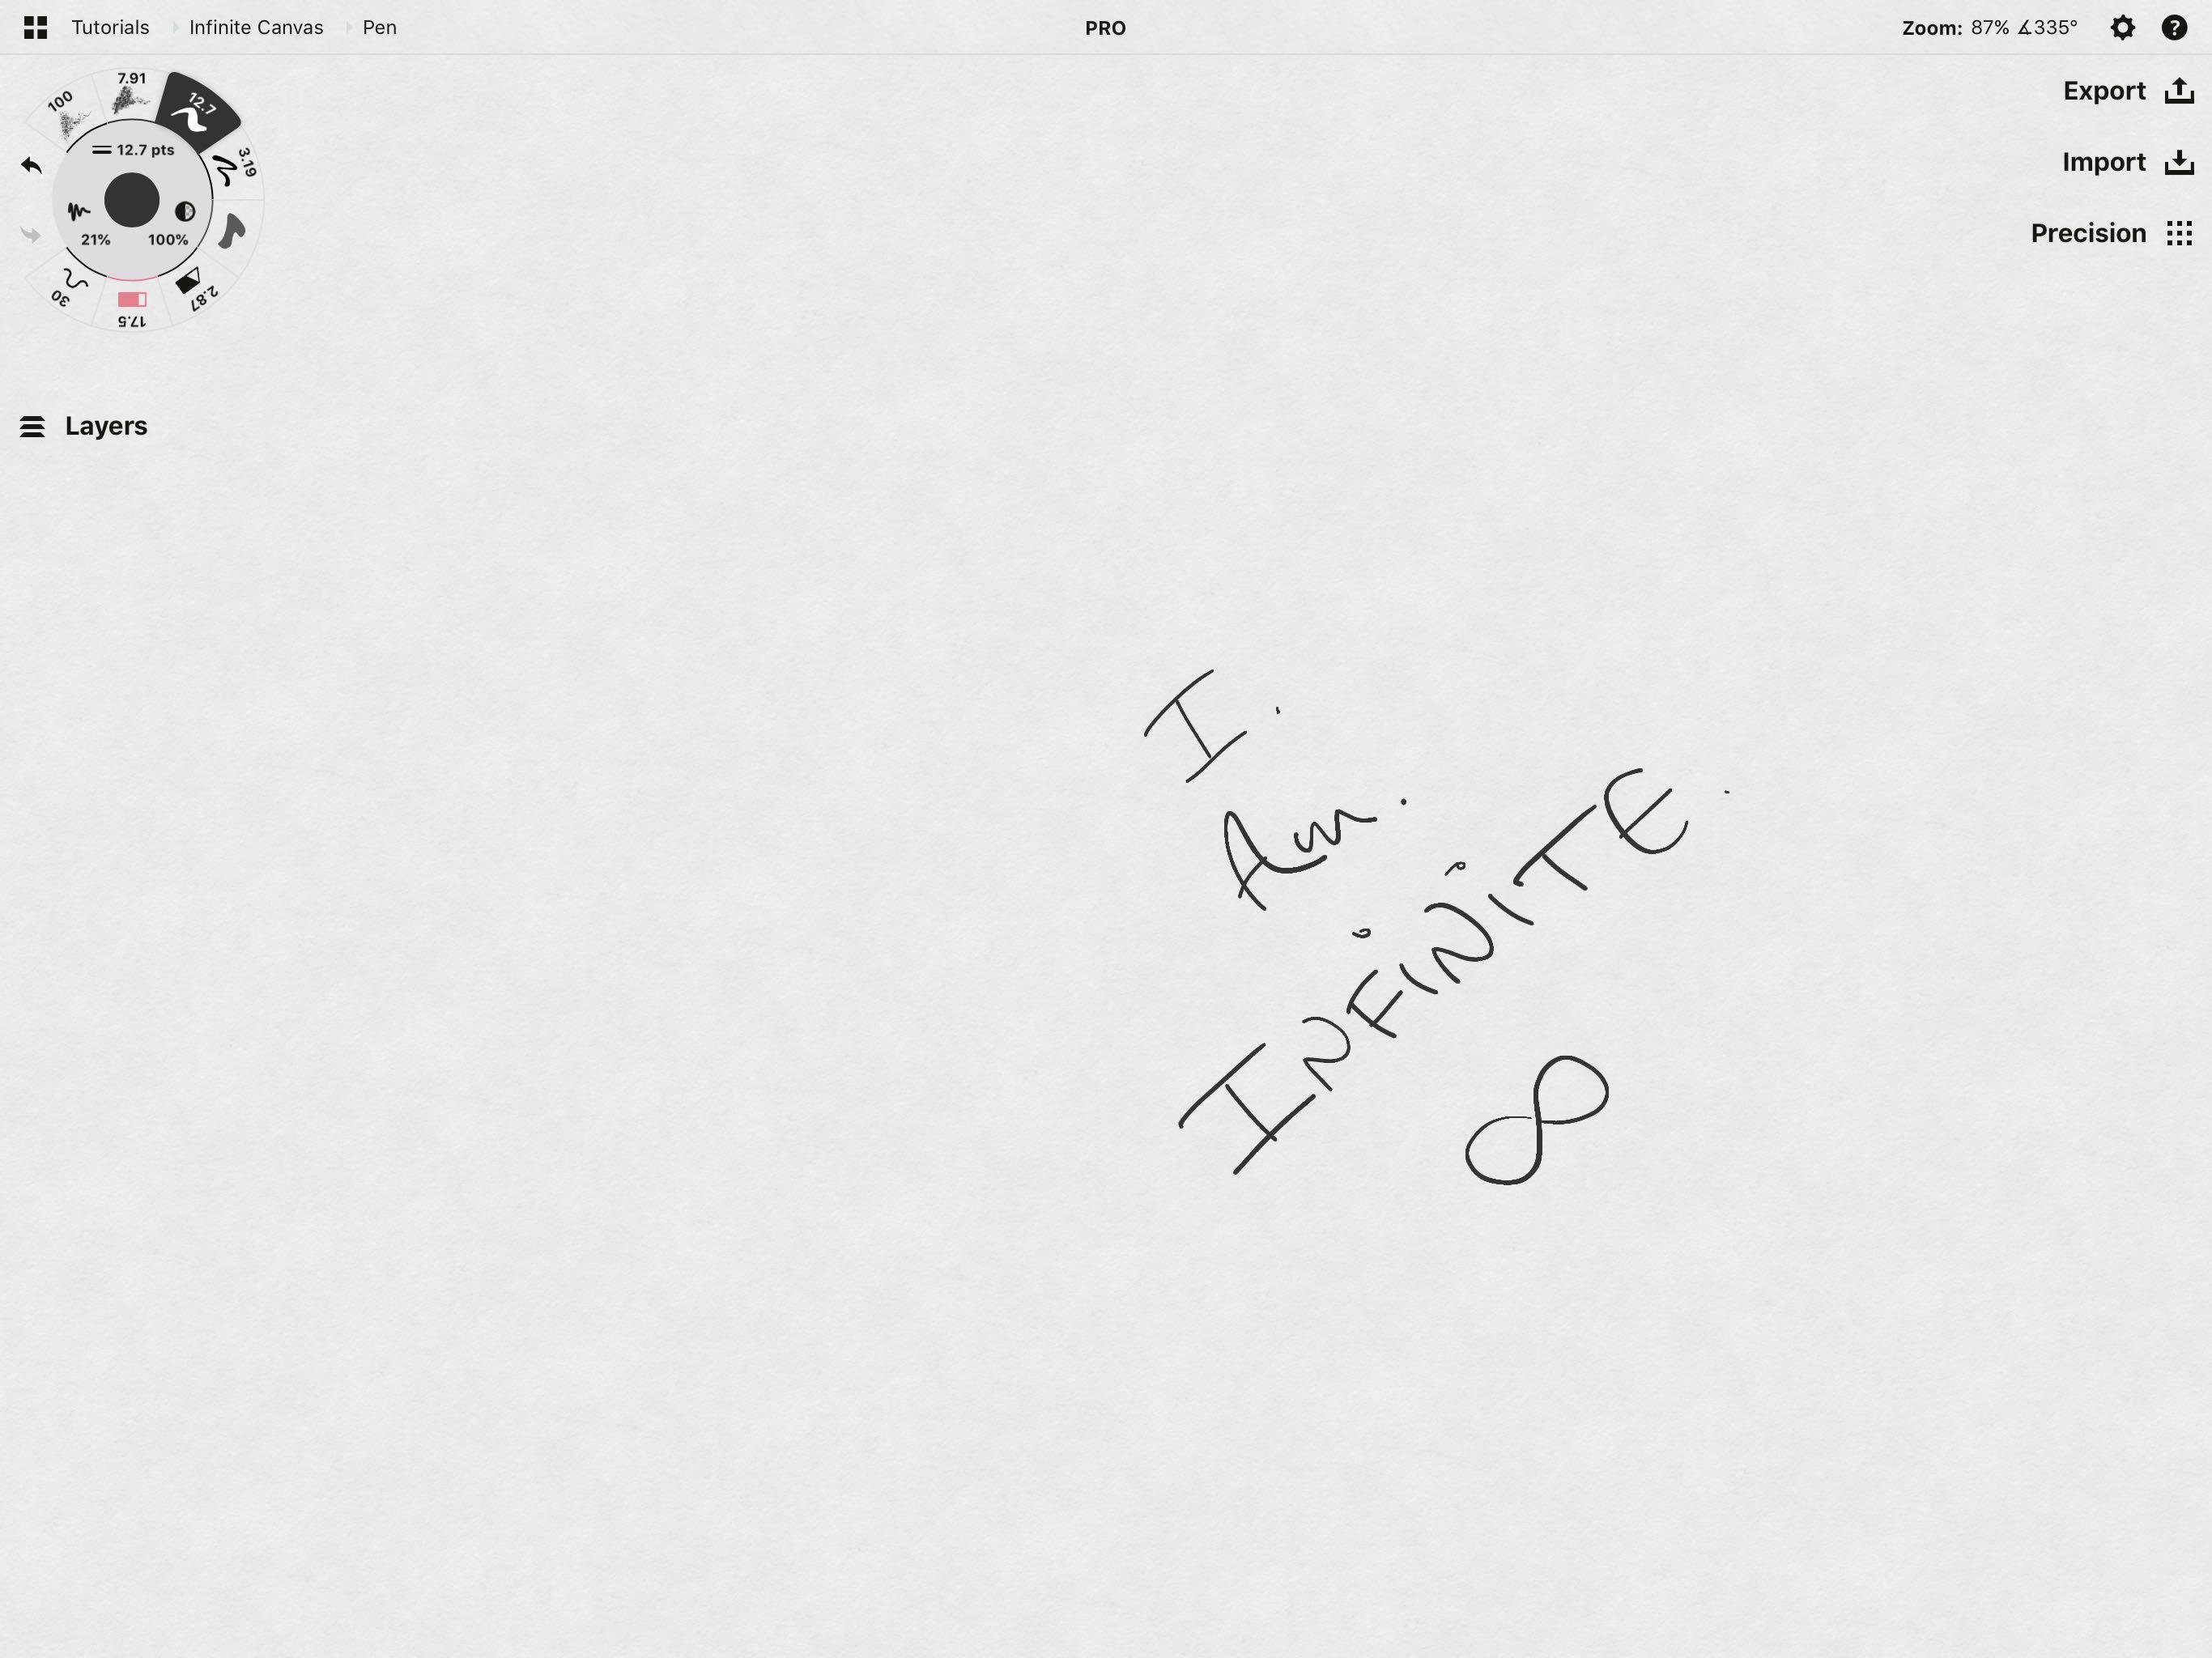 infinitecanvas_rotate1.JPG